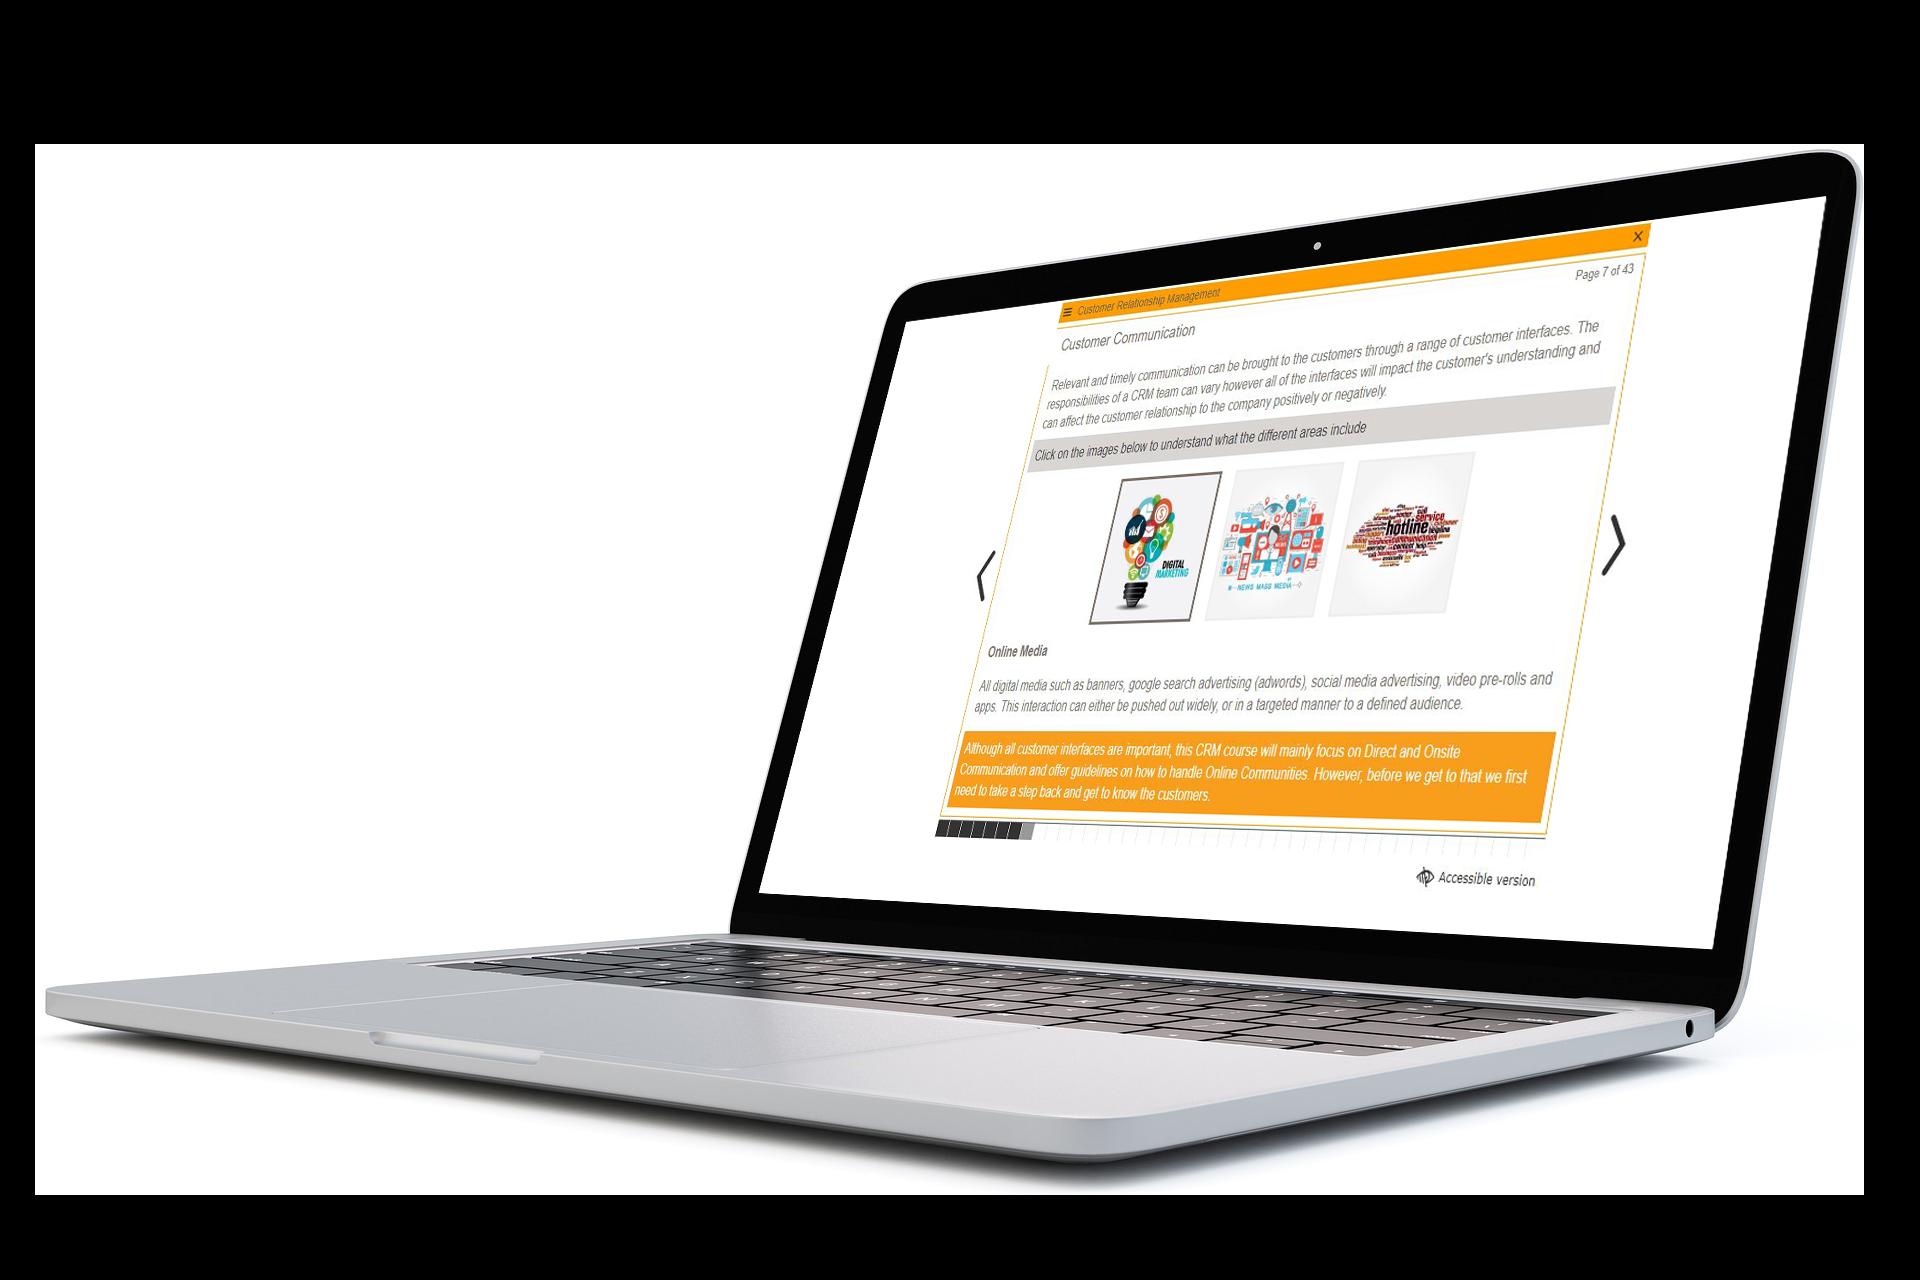 iGaming Academy eLearning Laptop